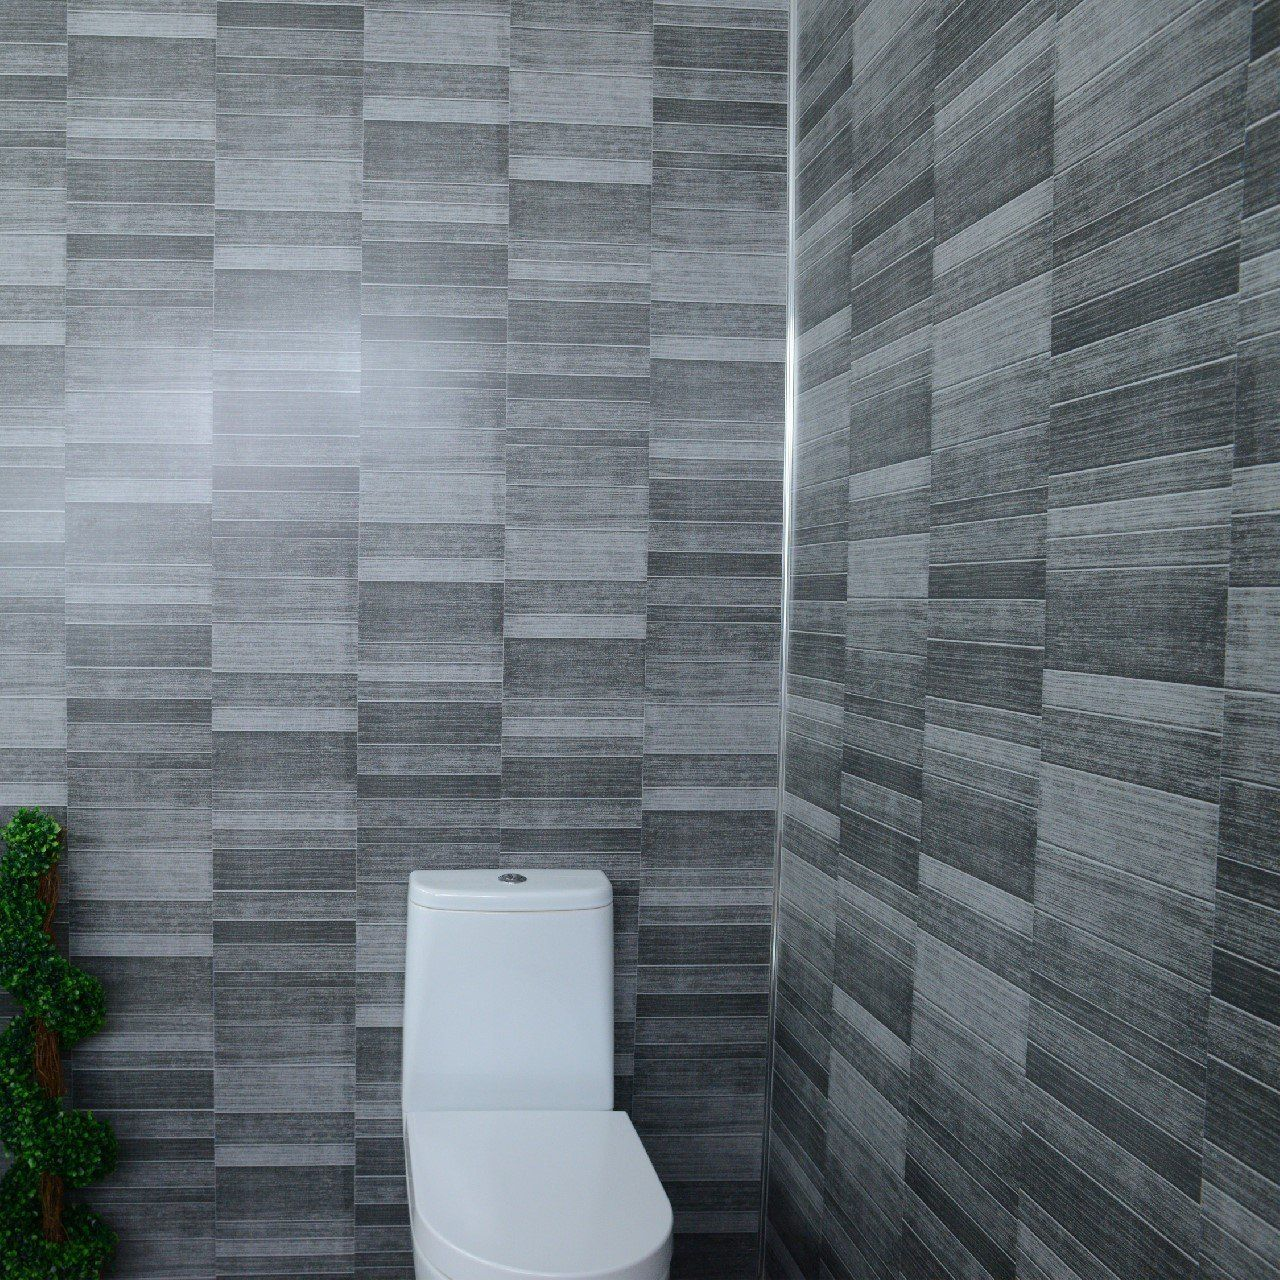 Dark Grey Bathroom Wall Panels Cladding Panels Kitchen Shower Wetrooms 100 Waterpro Bathroom Wall Panels Waterproof Bathroom Wall Panels Gray Bathroom Walls